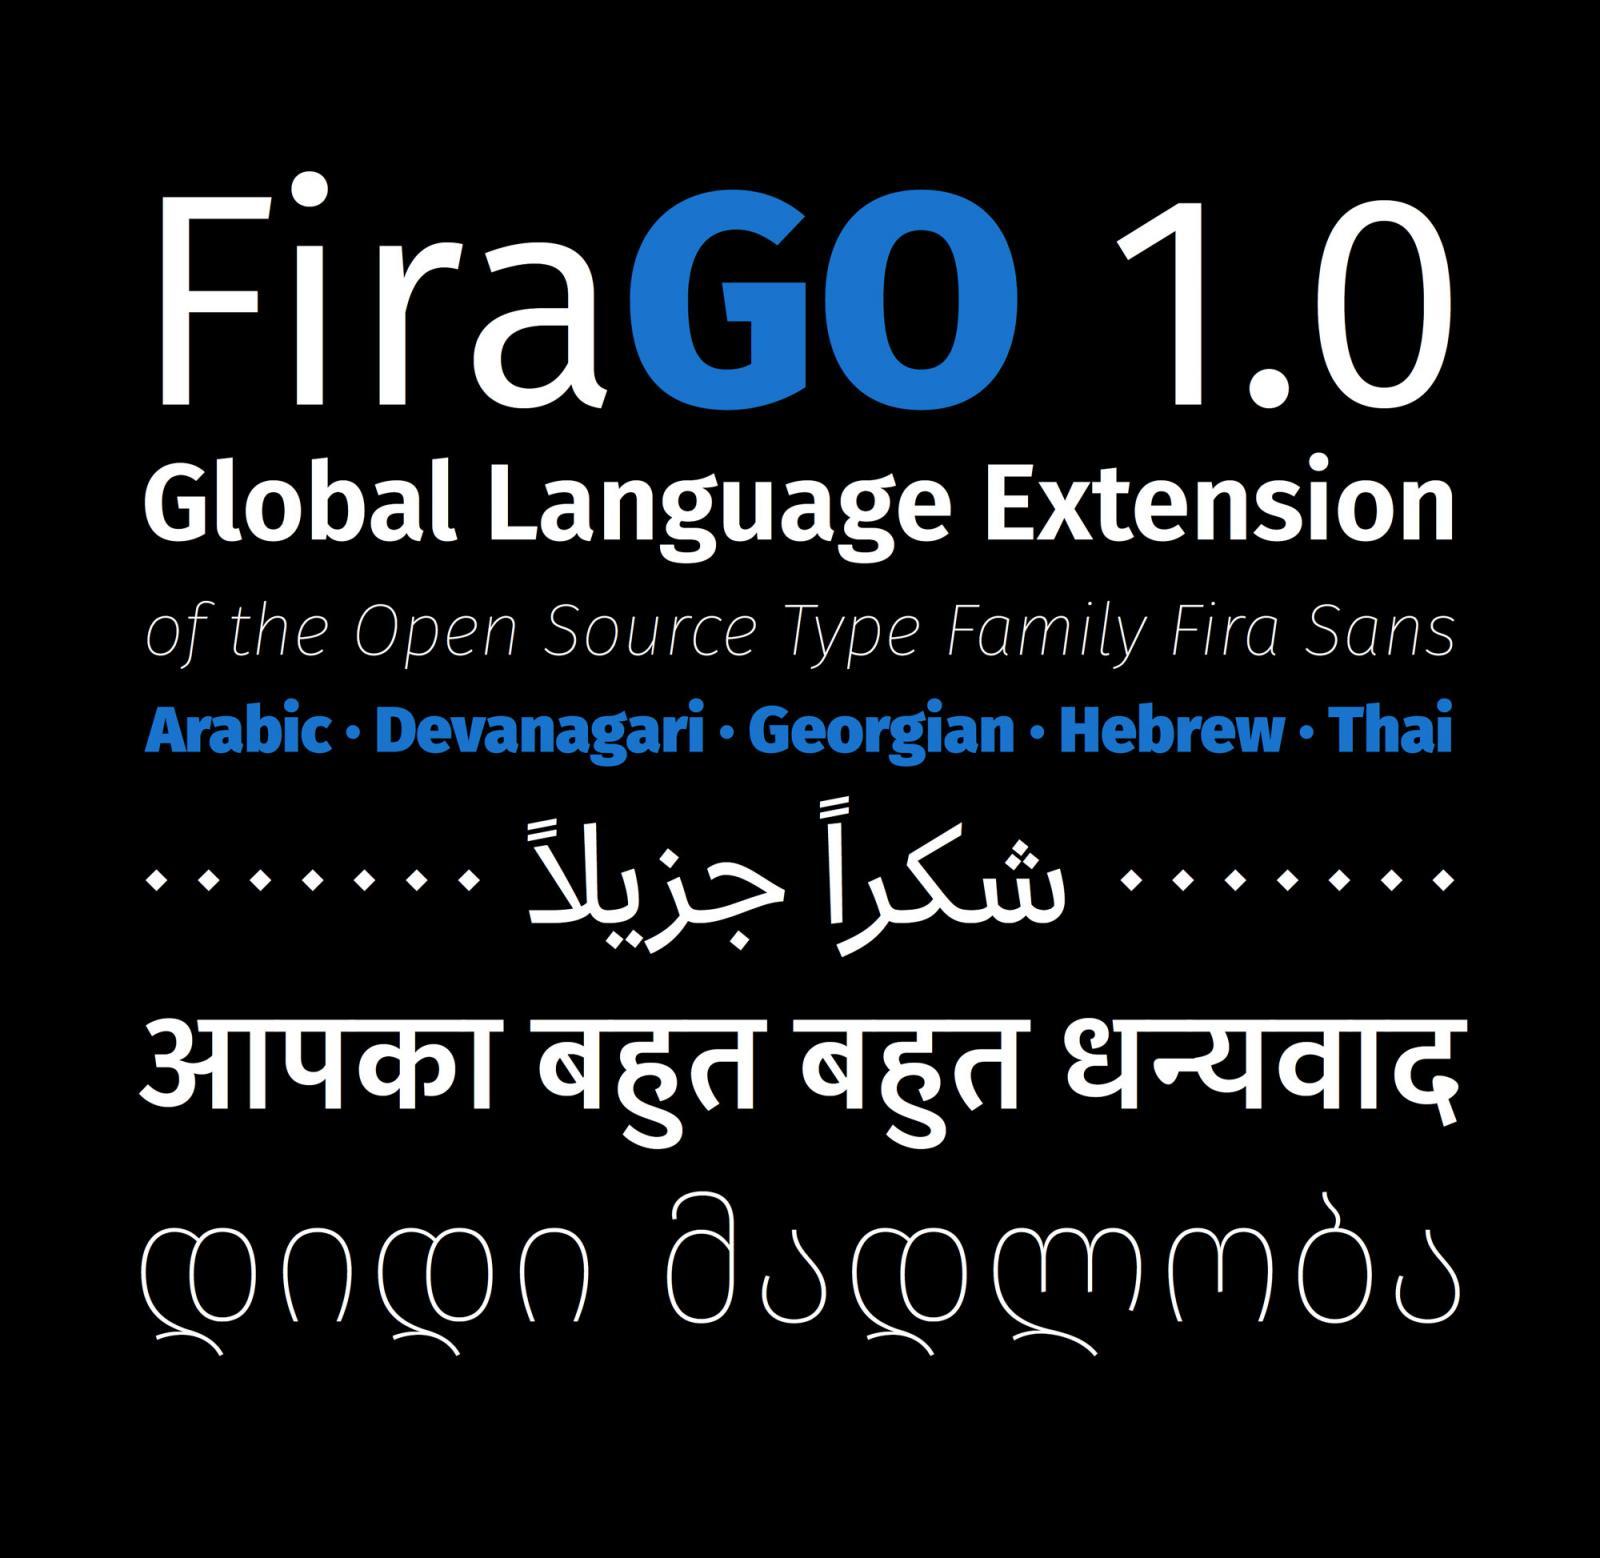 FiraGO: a new version of Fira Sans with extensive script